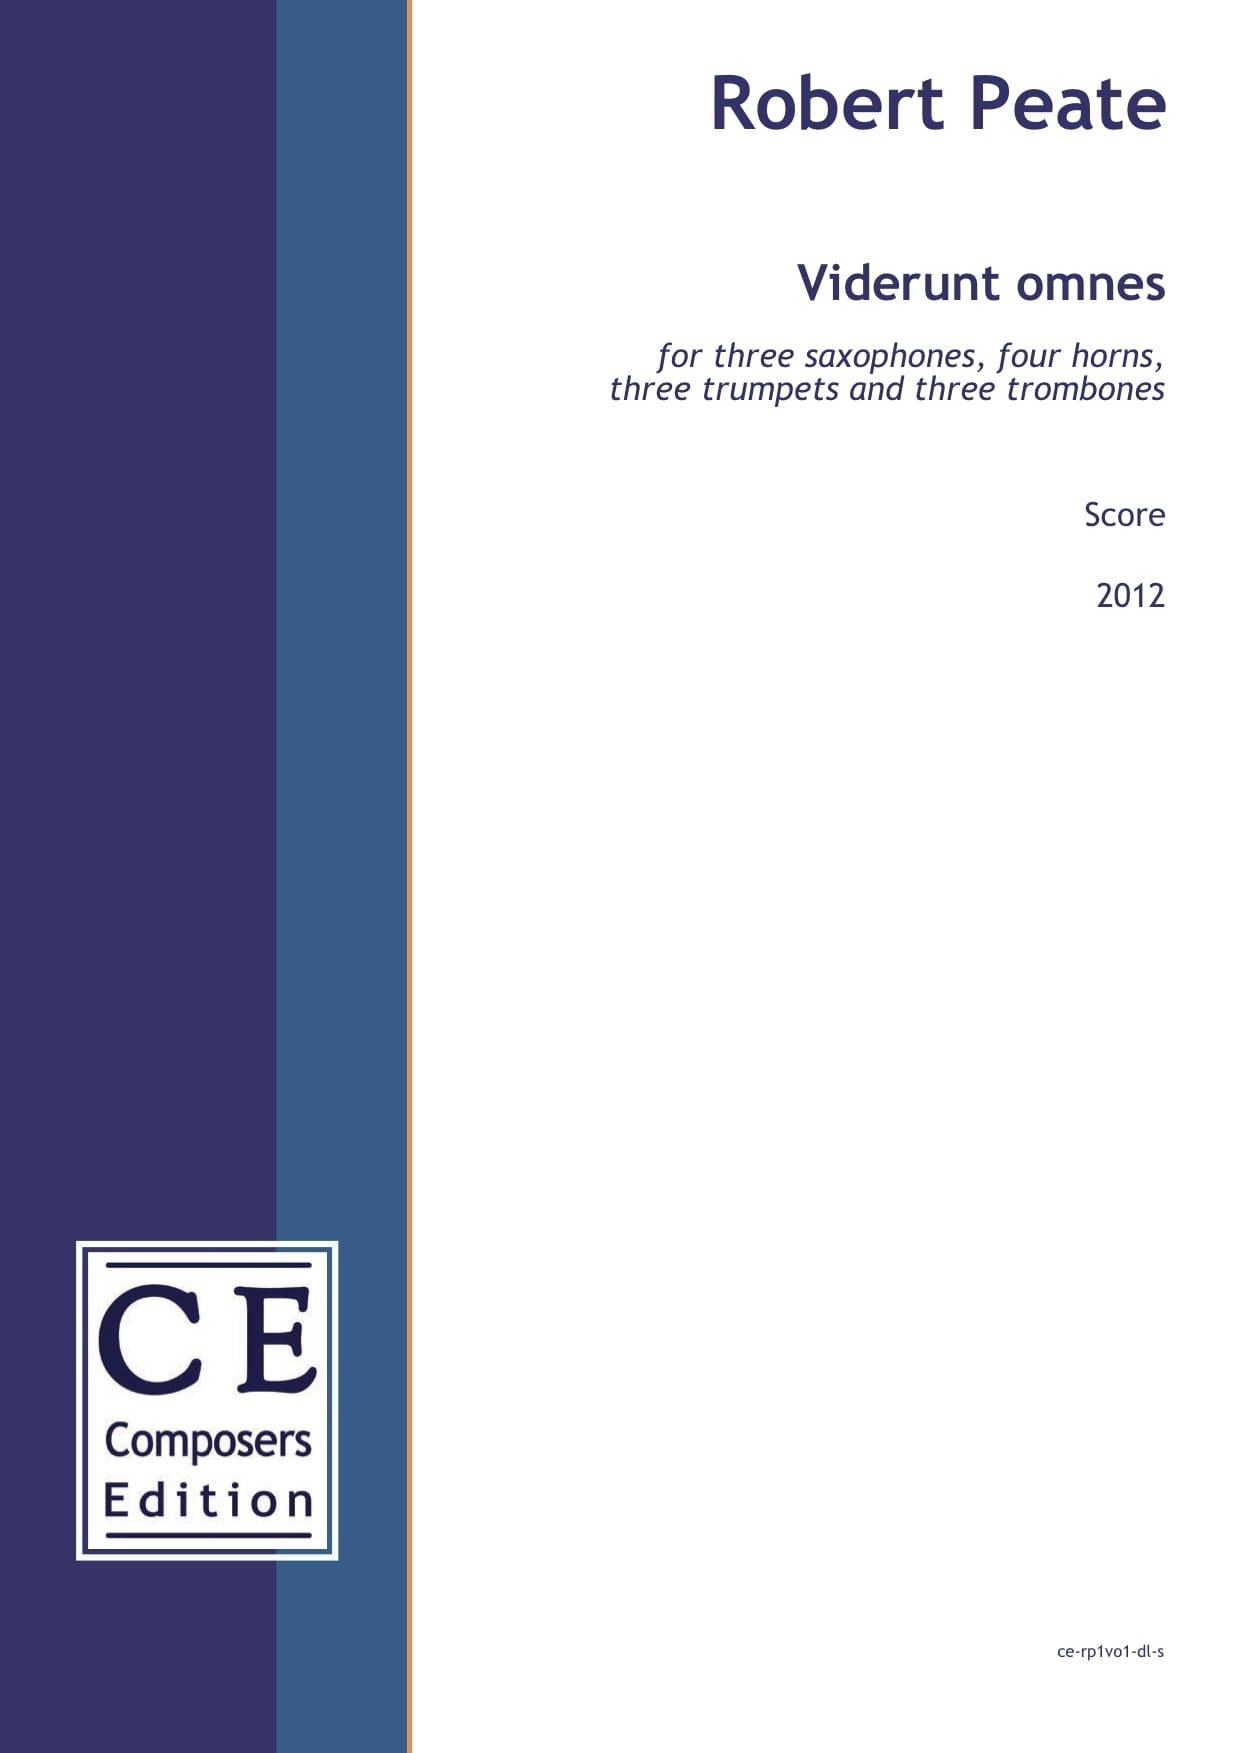 Robert Peate: Viderunt omnes for three saxophones, four horns, three trumpets and three trombones